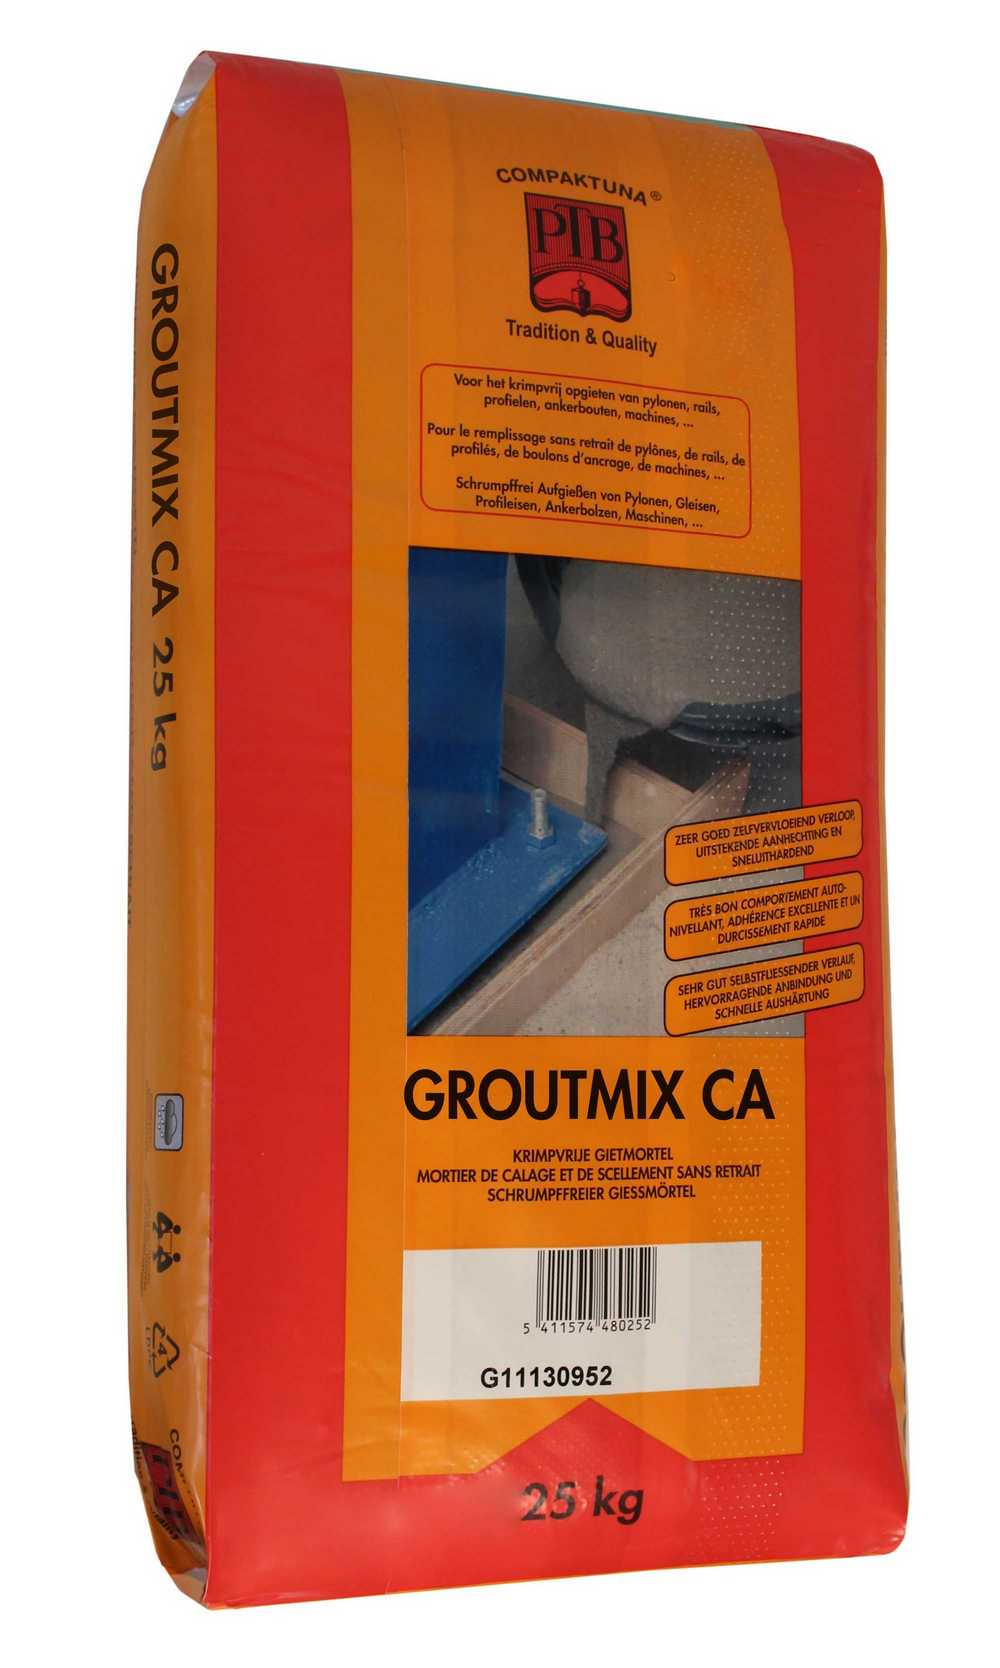 Groutmix CA - 25kg - Grijs (krimpvrije gietmortel)